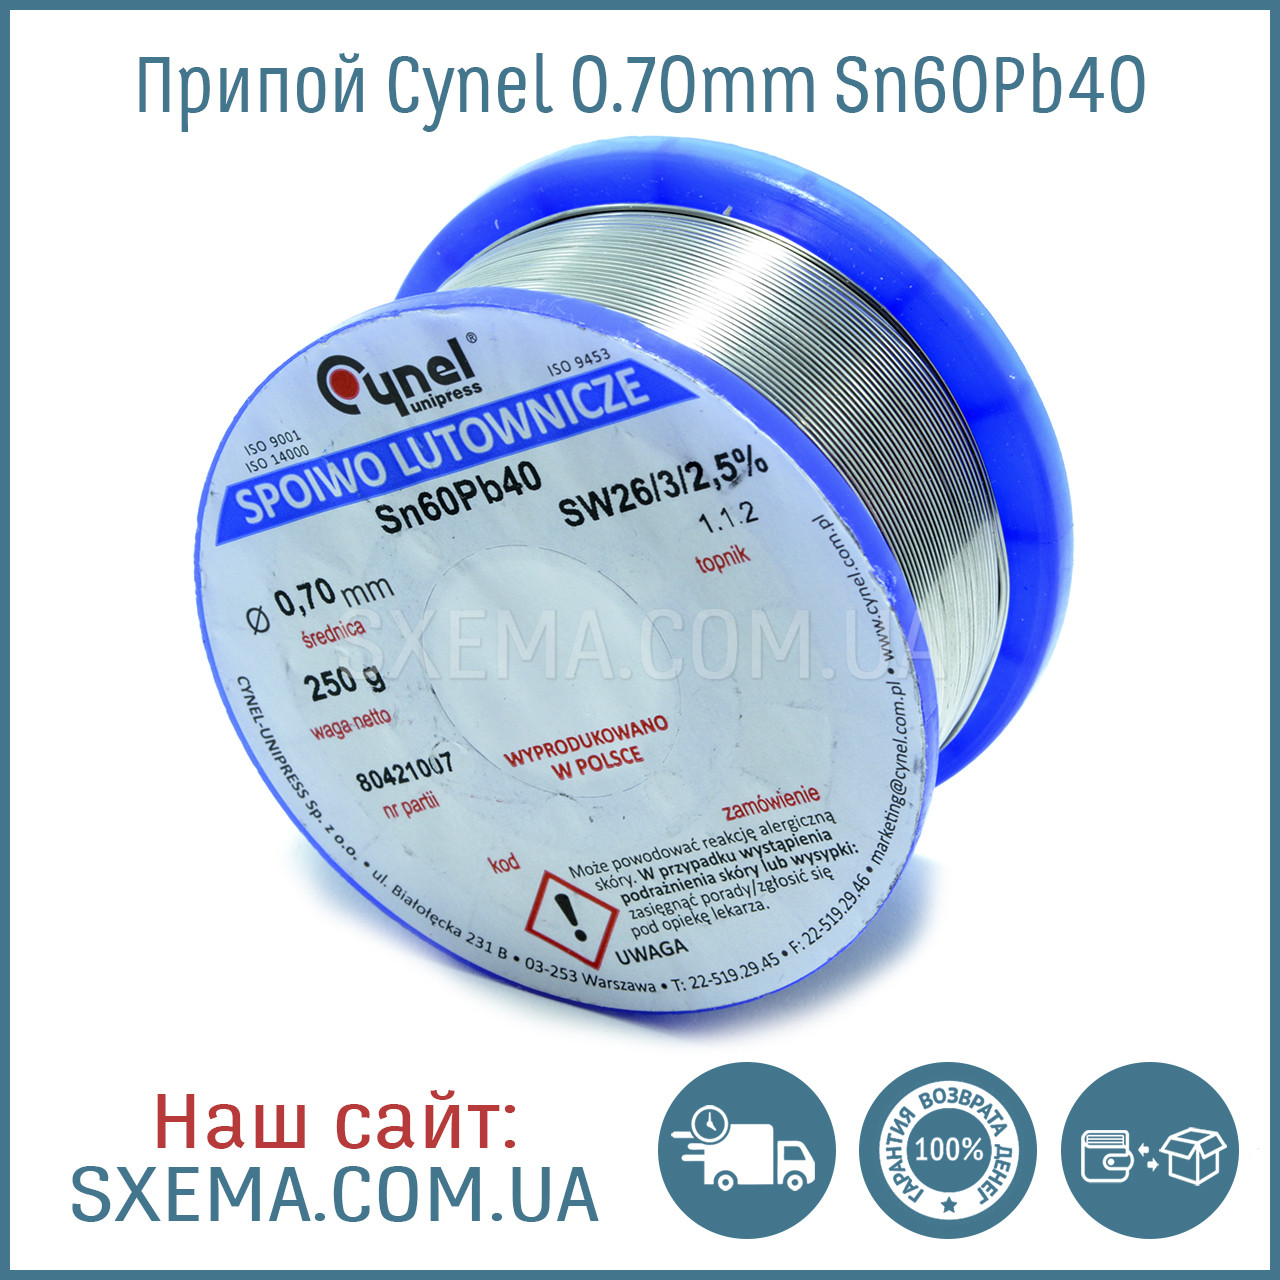 Припой для пайки, оловянно-свинцовый Cynel SW26/3/2.5 250гр (0.7мм)